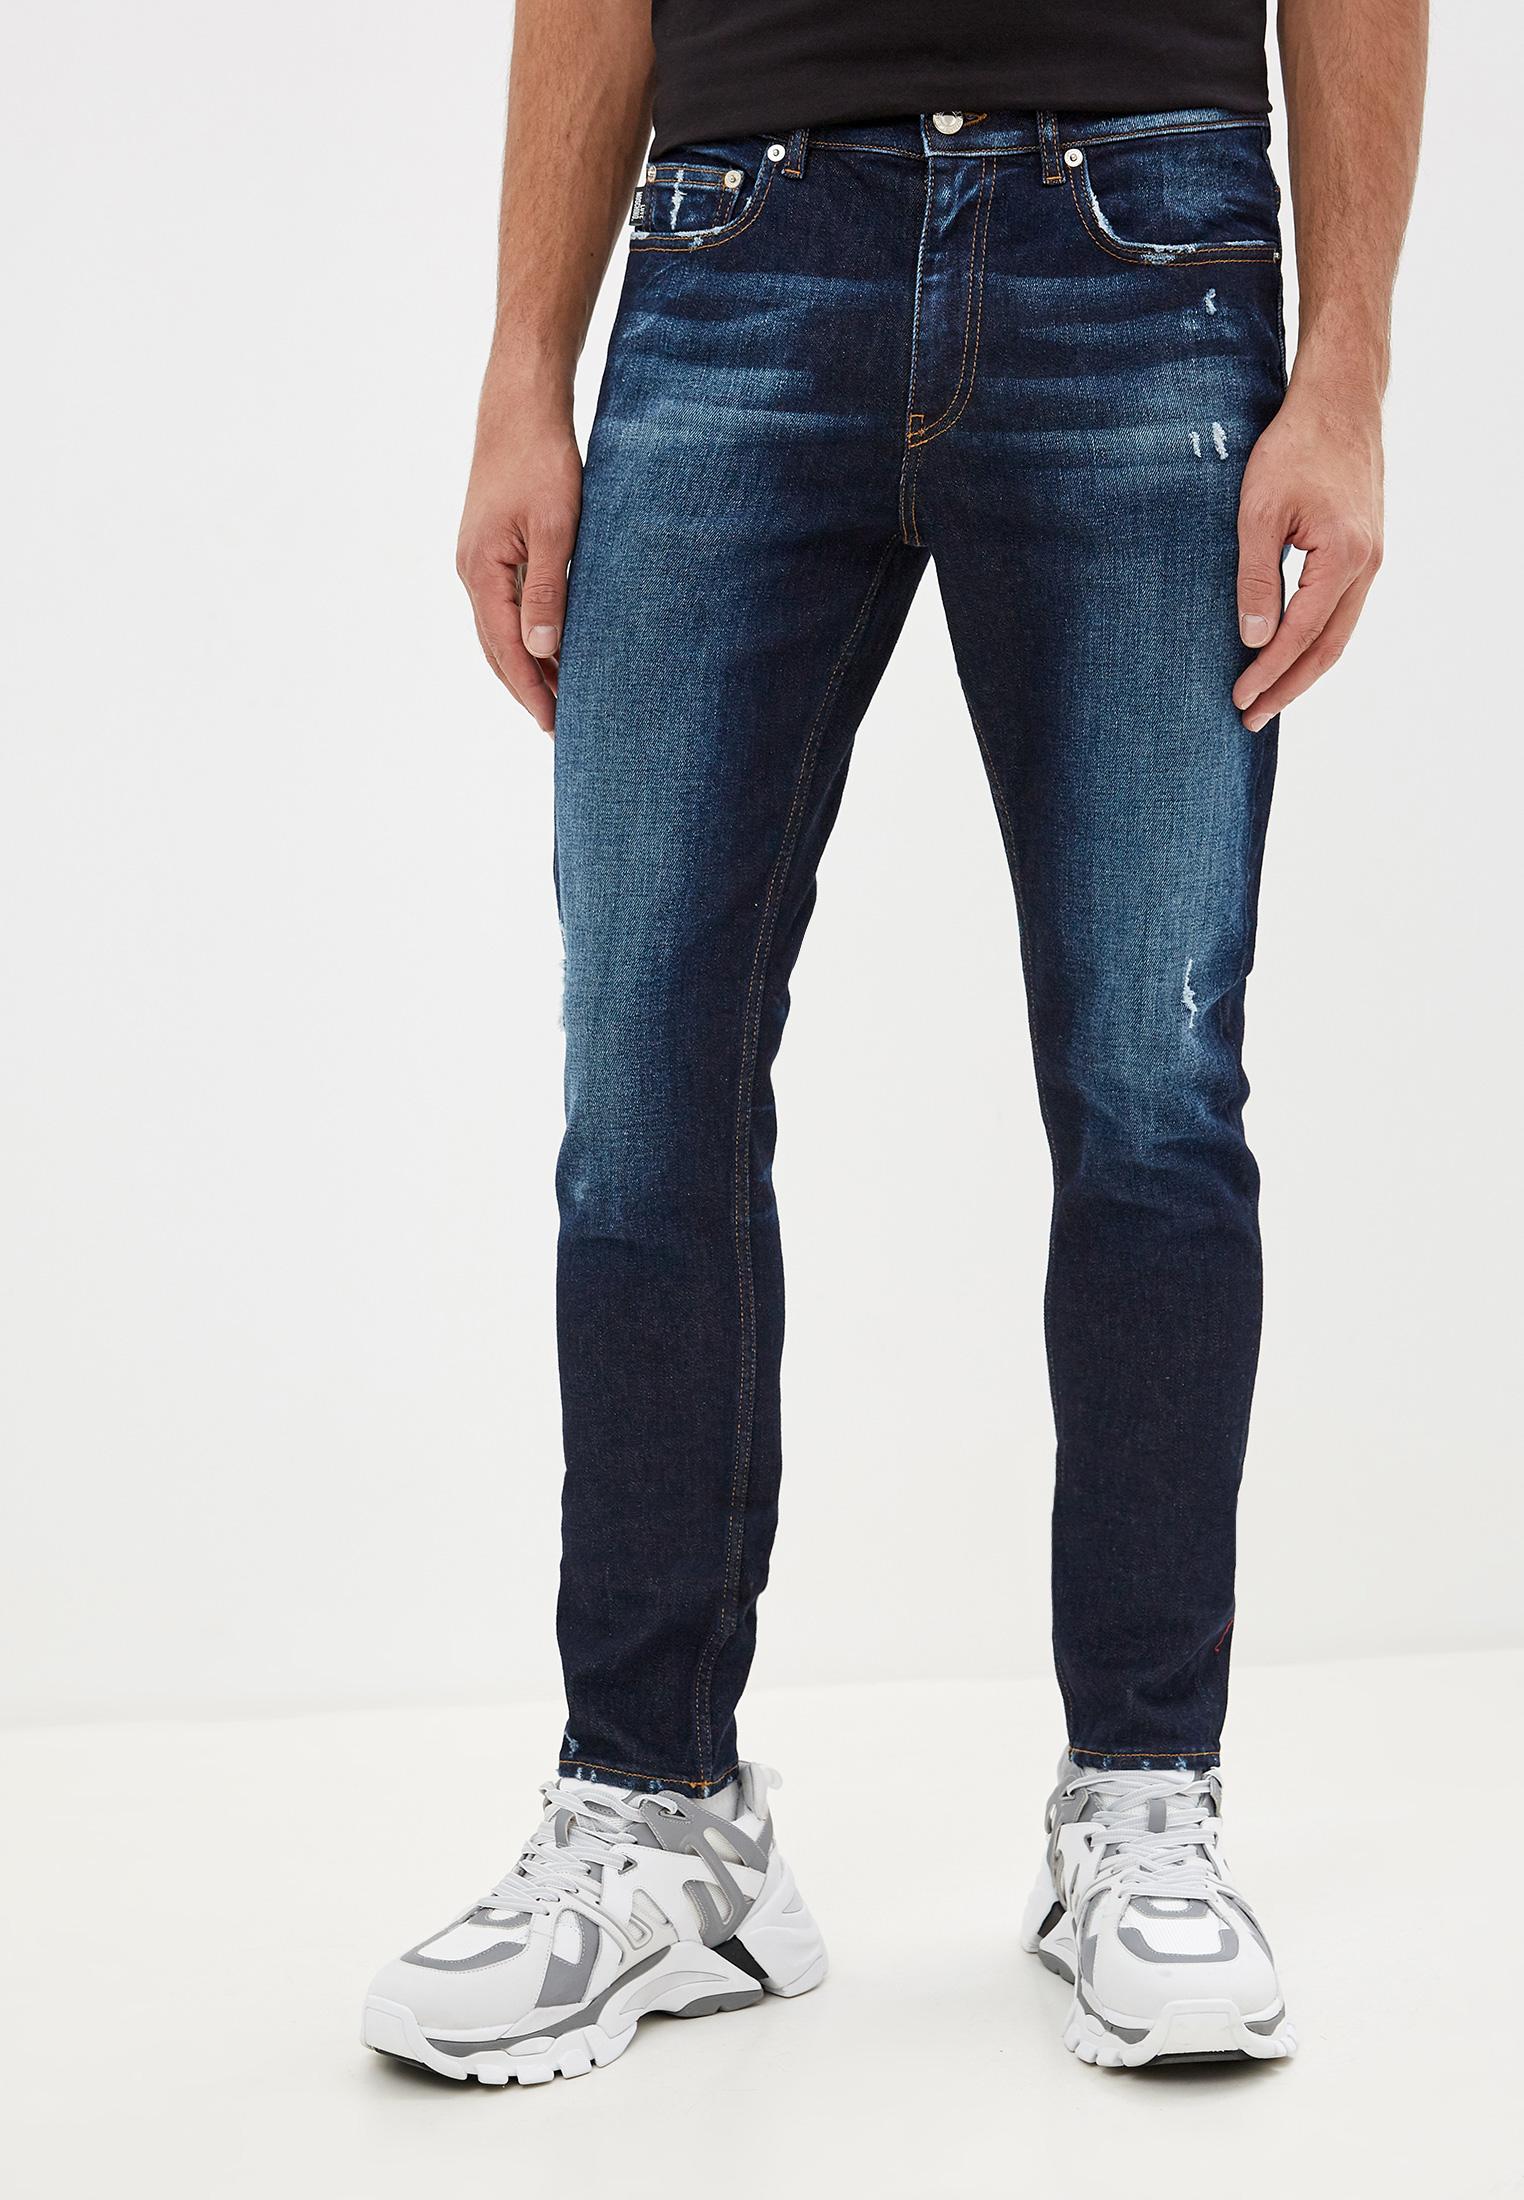 Зауженные джинсы Love Moschino M Q 421 37 S 3305